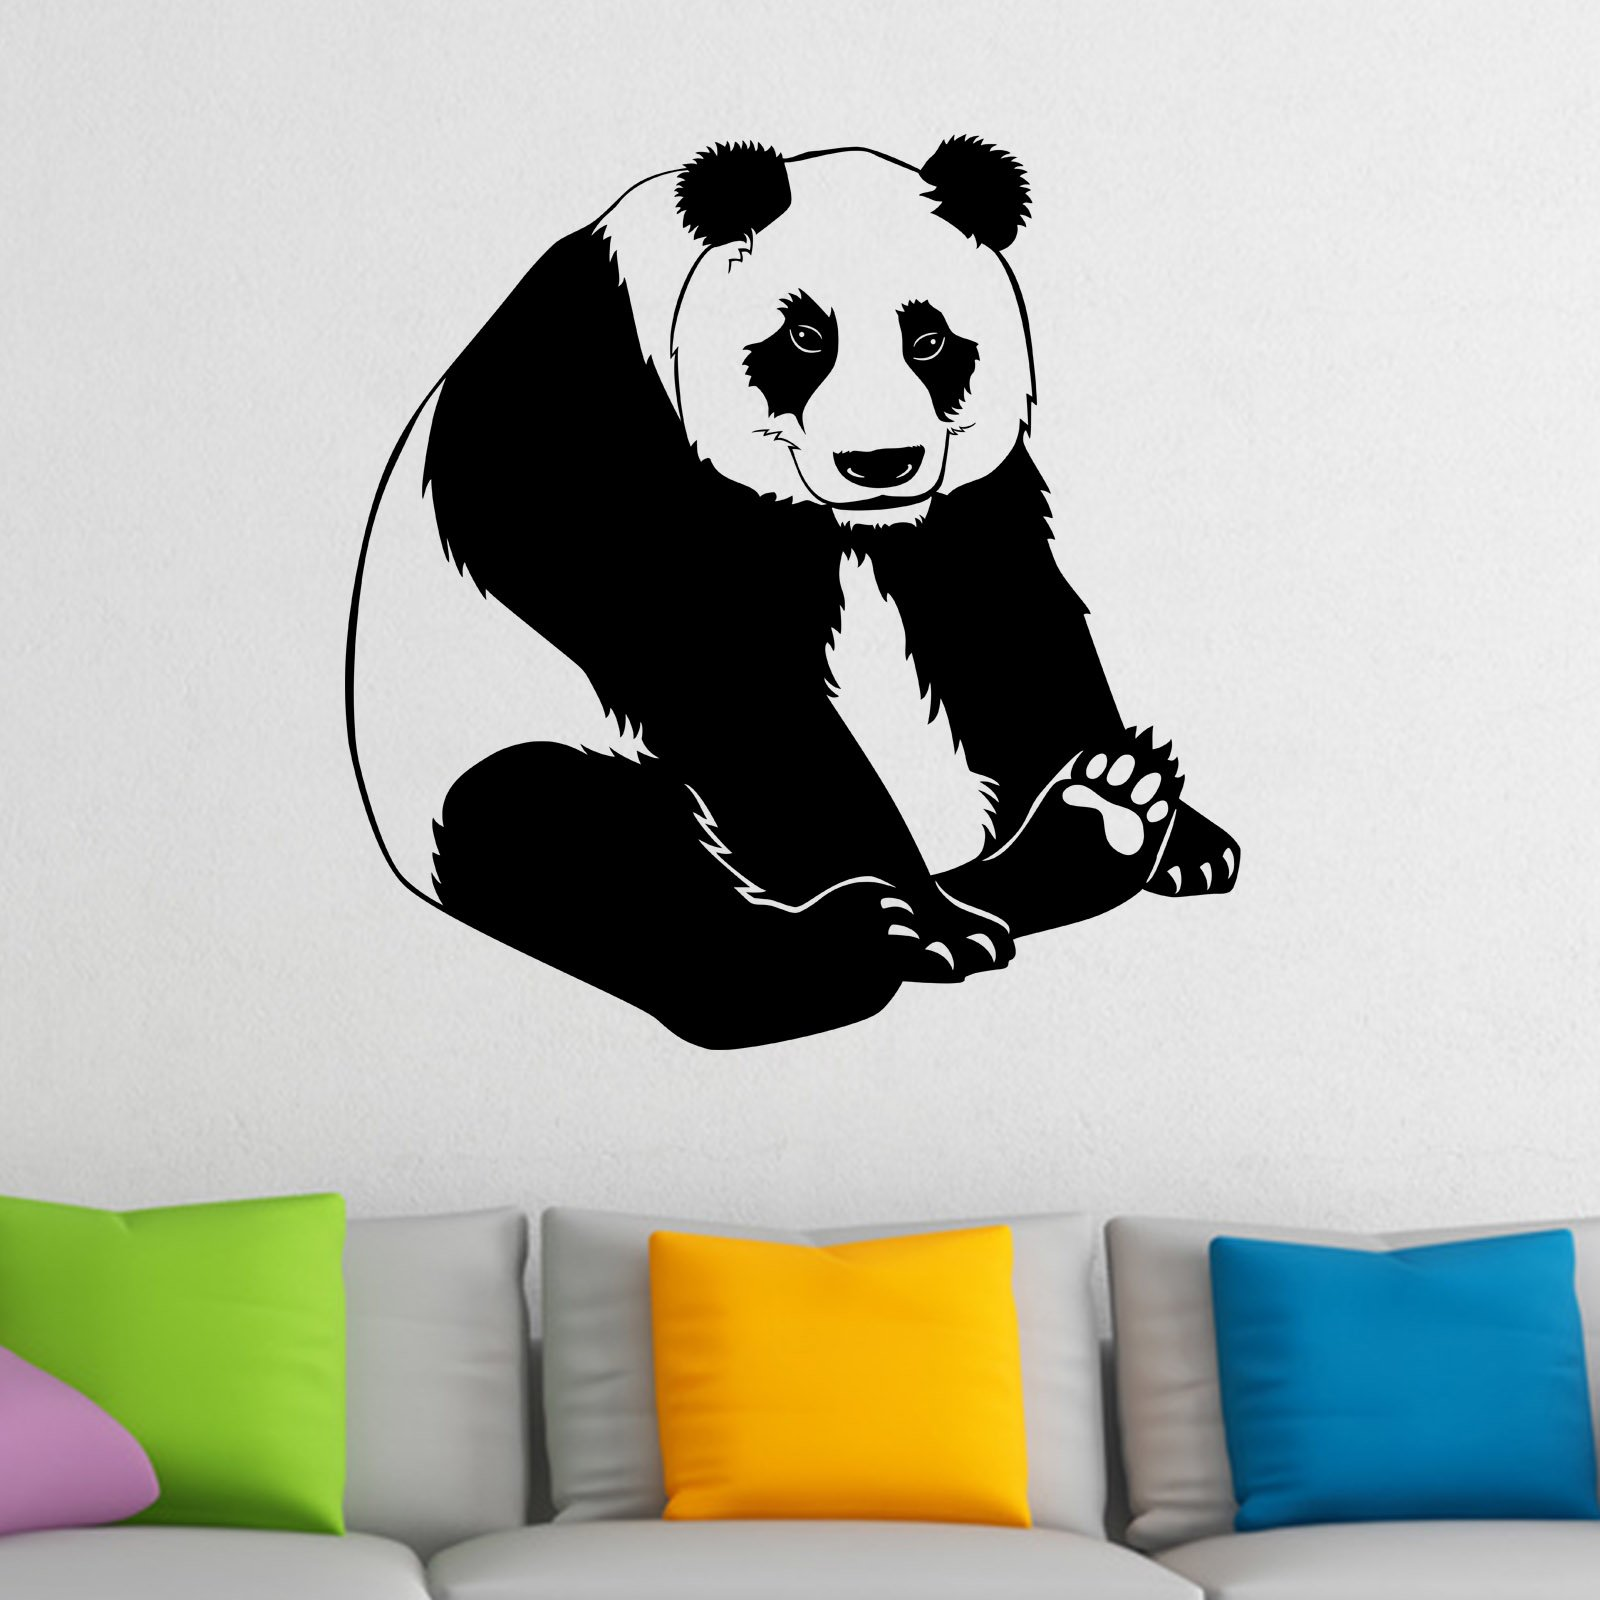 happy panda bear animal wall sticker world of wall stickers happy panda bear animal wall sticker decal a